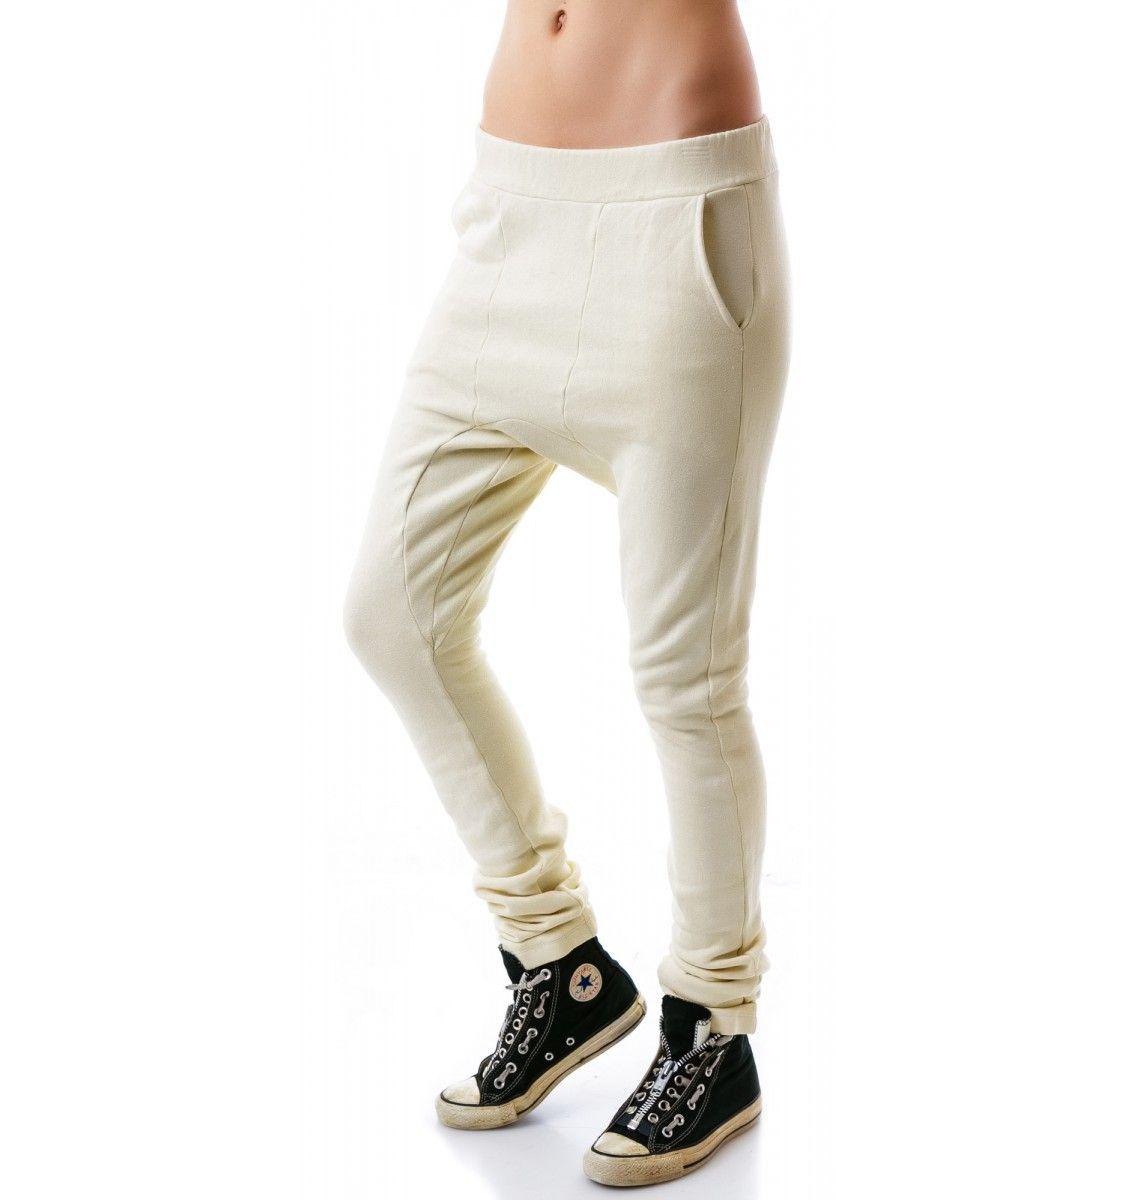 hammer time drop crotch pants drop crotch pants drop crotch and